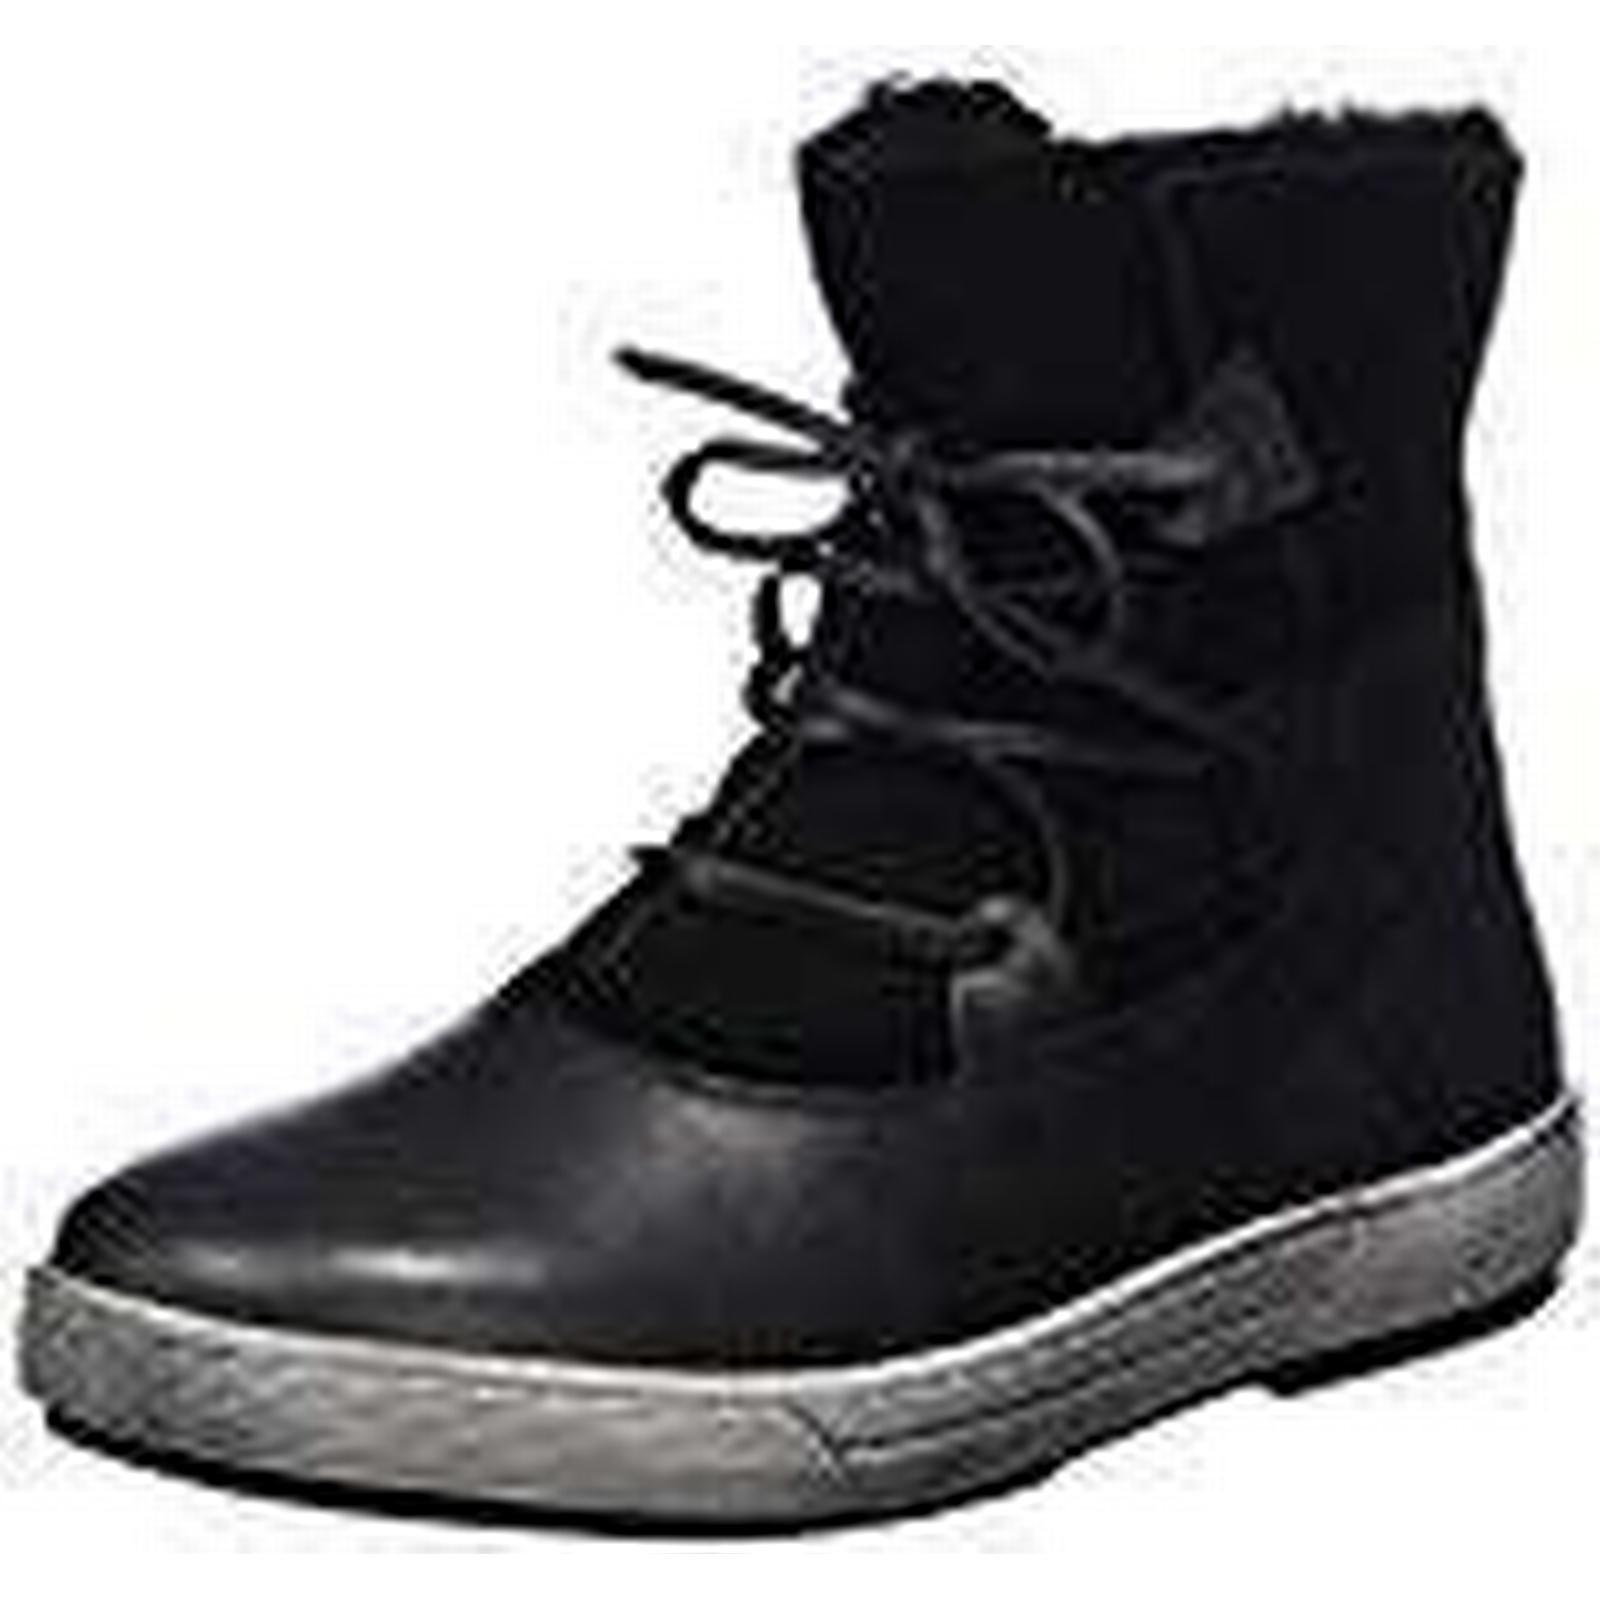 Ganter Women's Size: Helena-h Ankle Boots Black Size: Women's 7 UK 5c9190